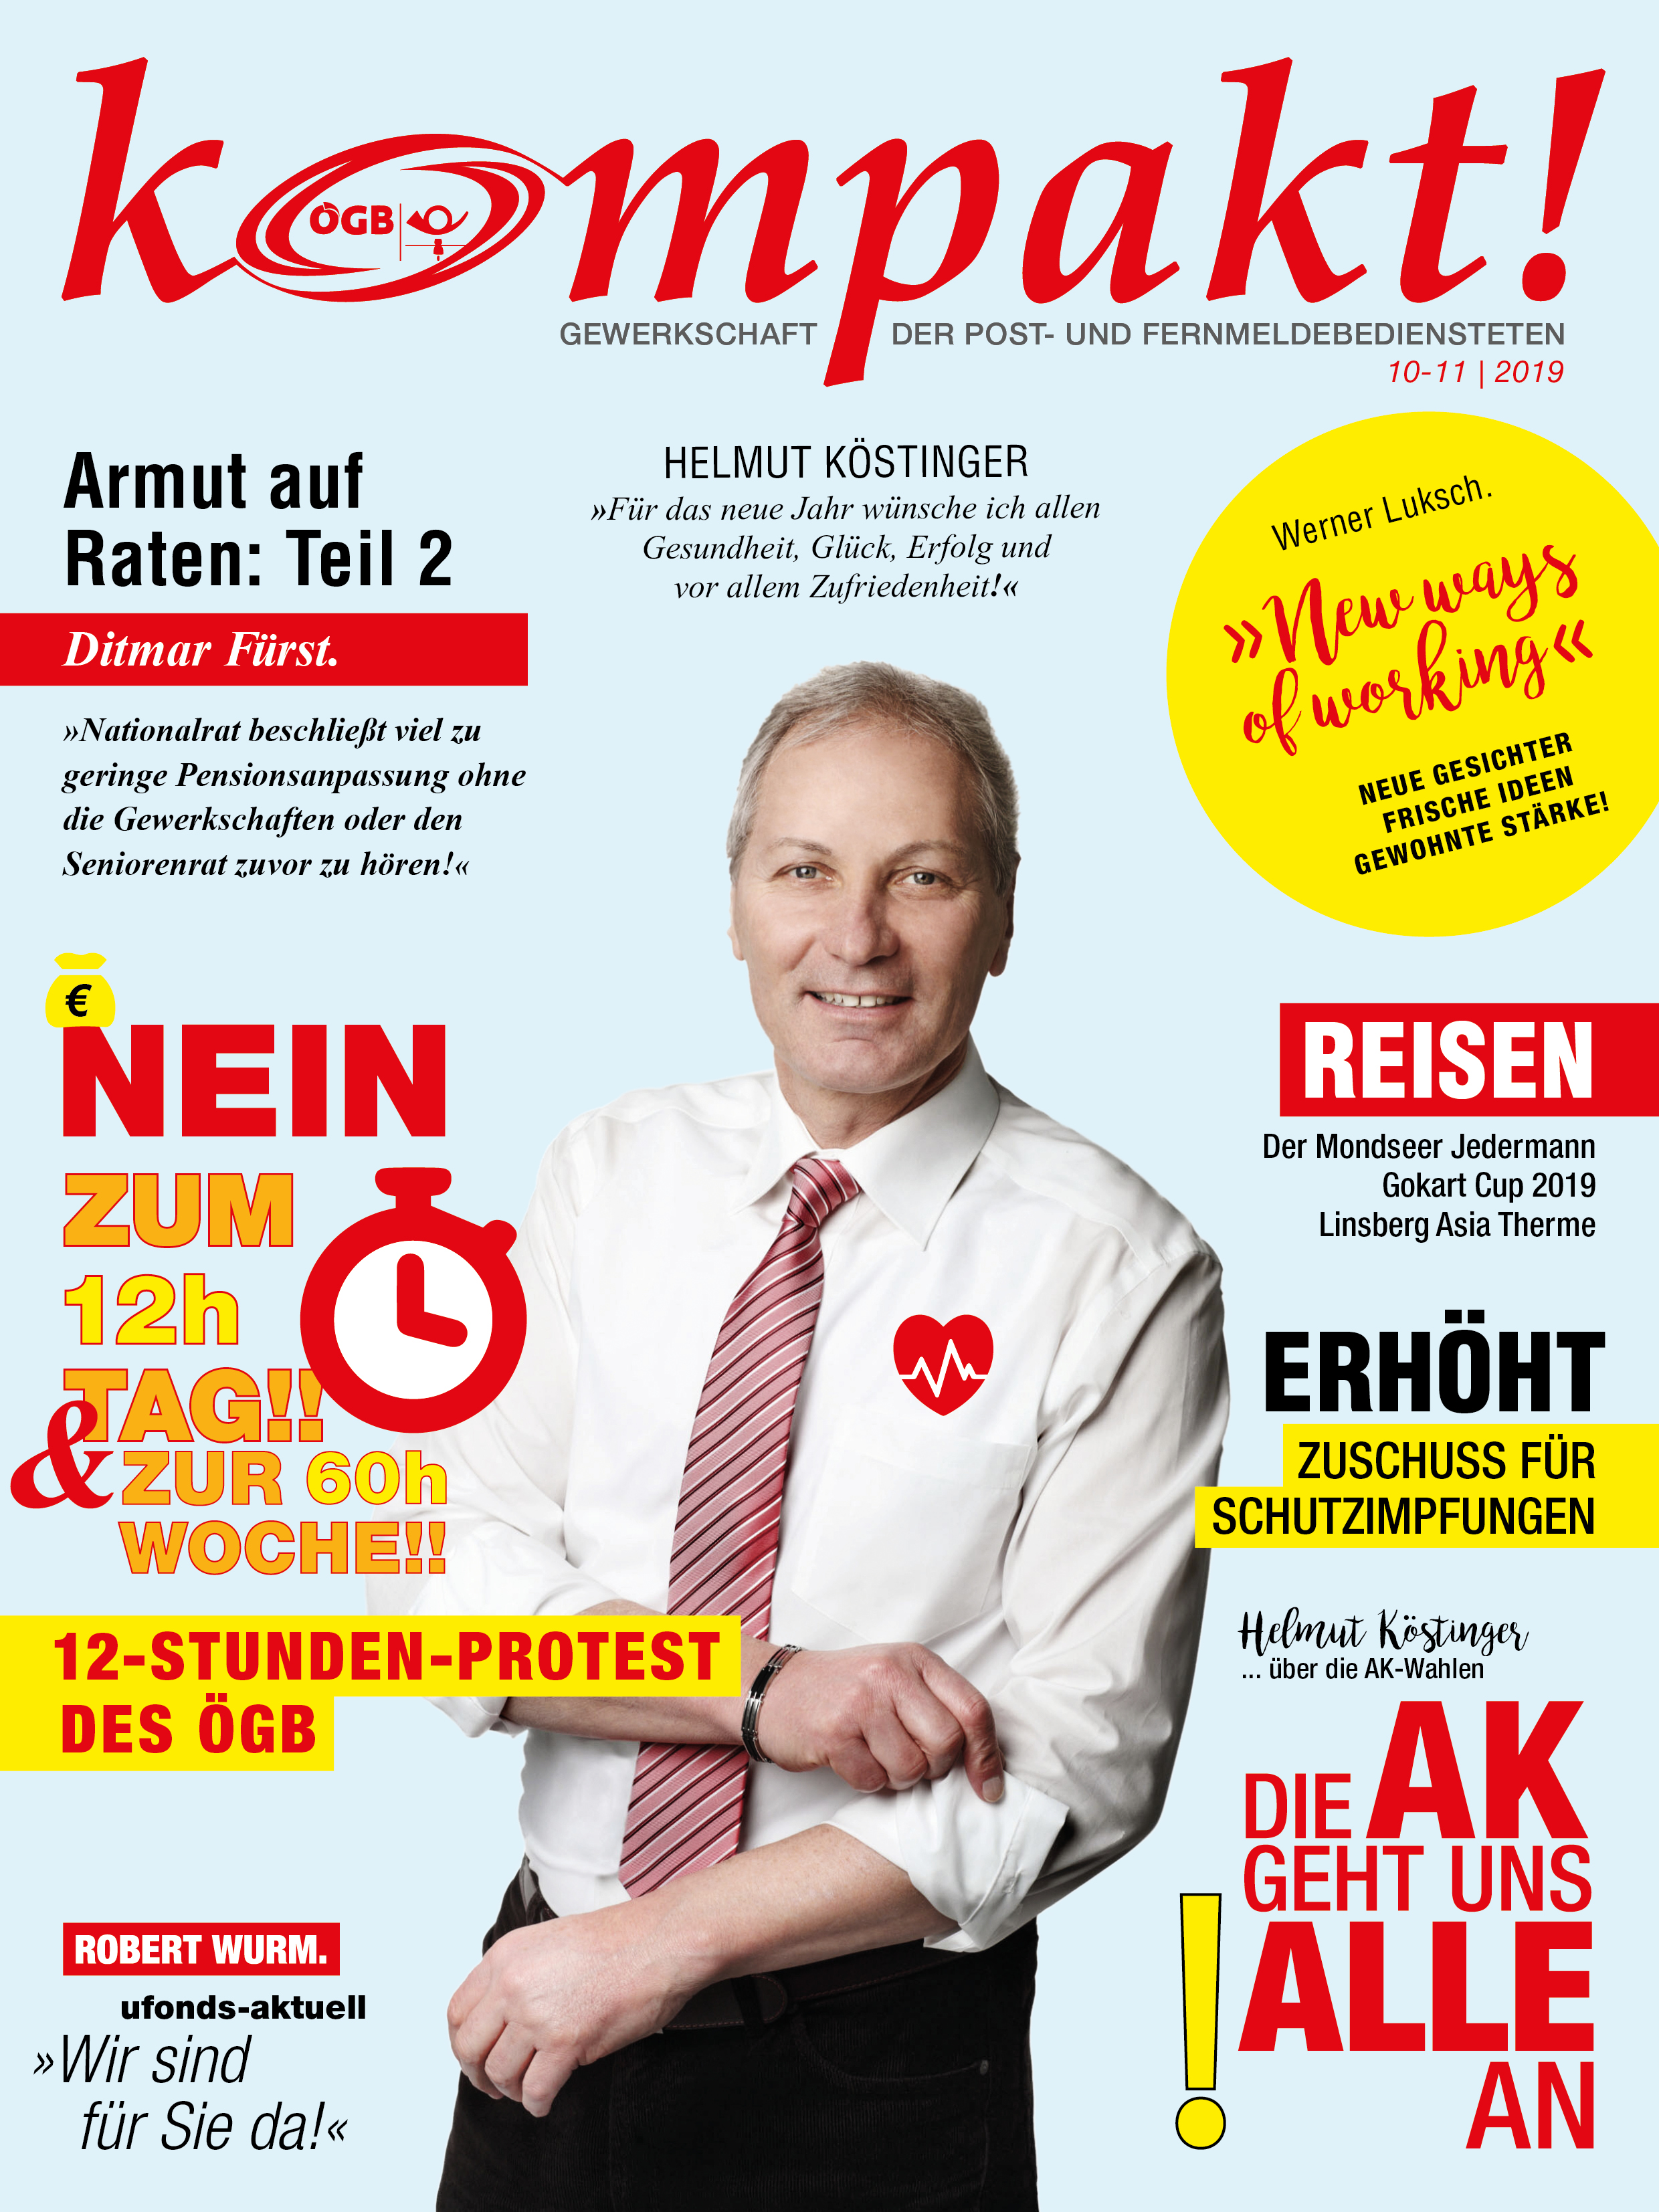 GPF_Kompakt_Ausgabe 10-11_Titelblatt